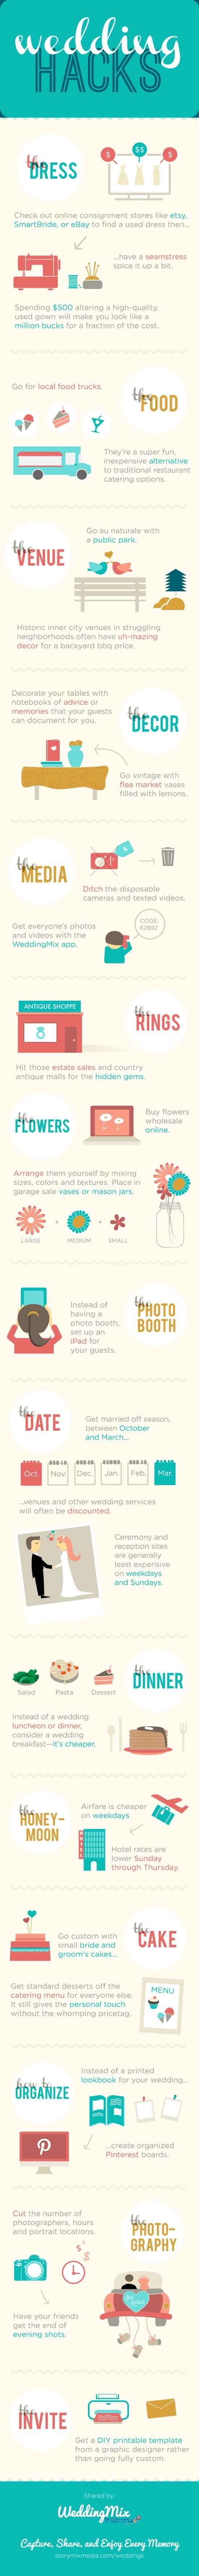 DIY Wedding Ideas | Cool Hacks for DIY Weddings on a Budget - cheap ideas and budget tips [ Infographic ] save money on wedding, frugal wedding ideas #wedding #frugal